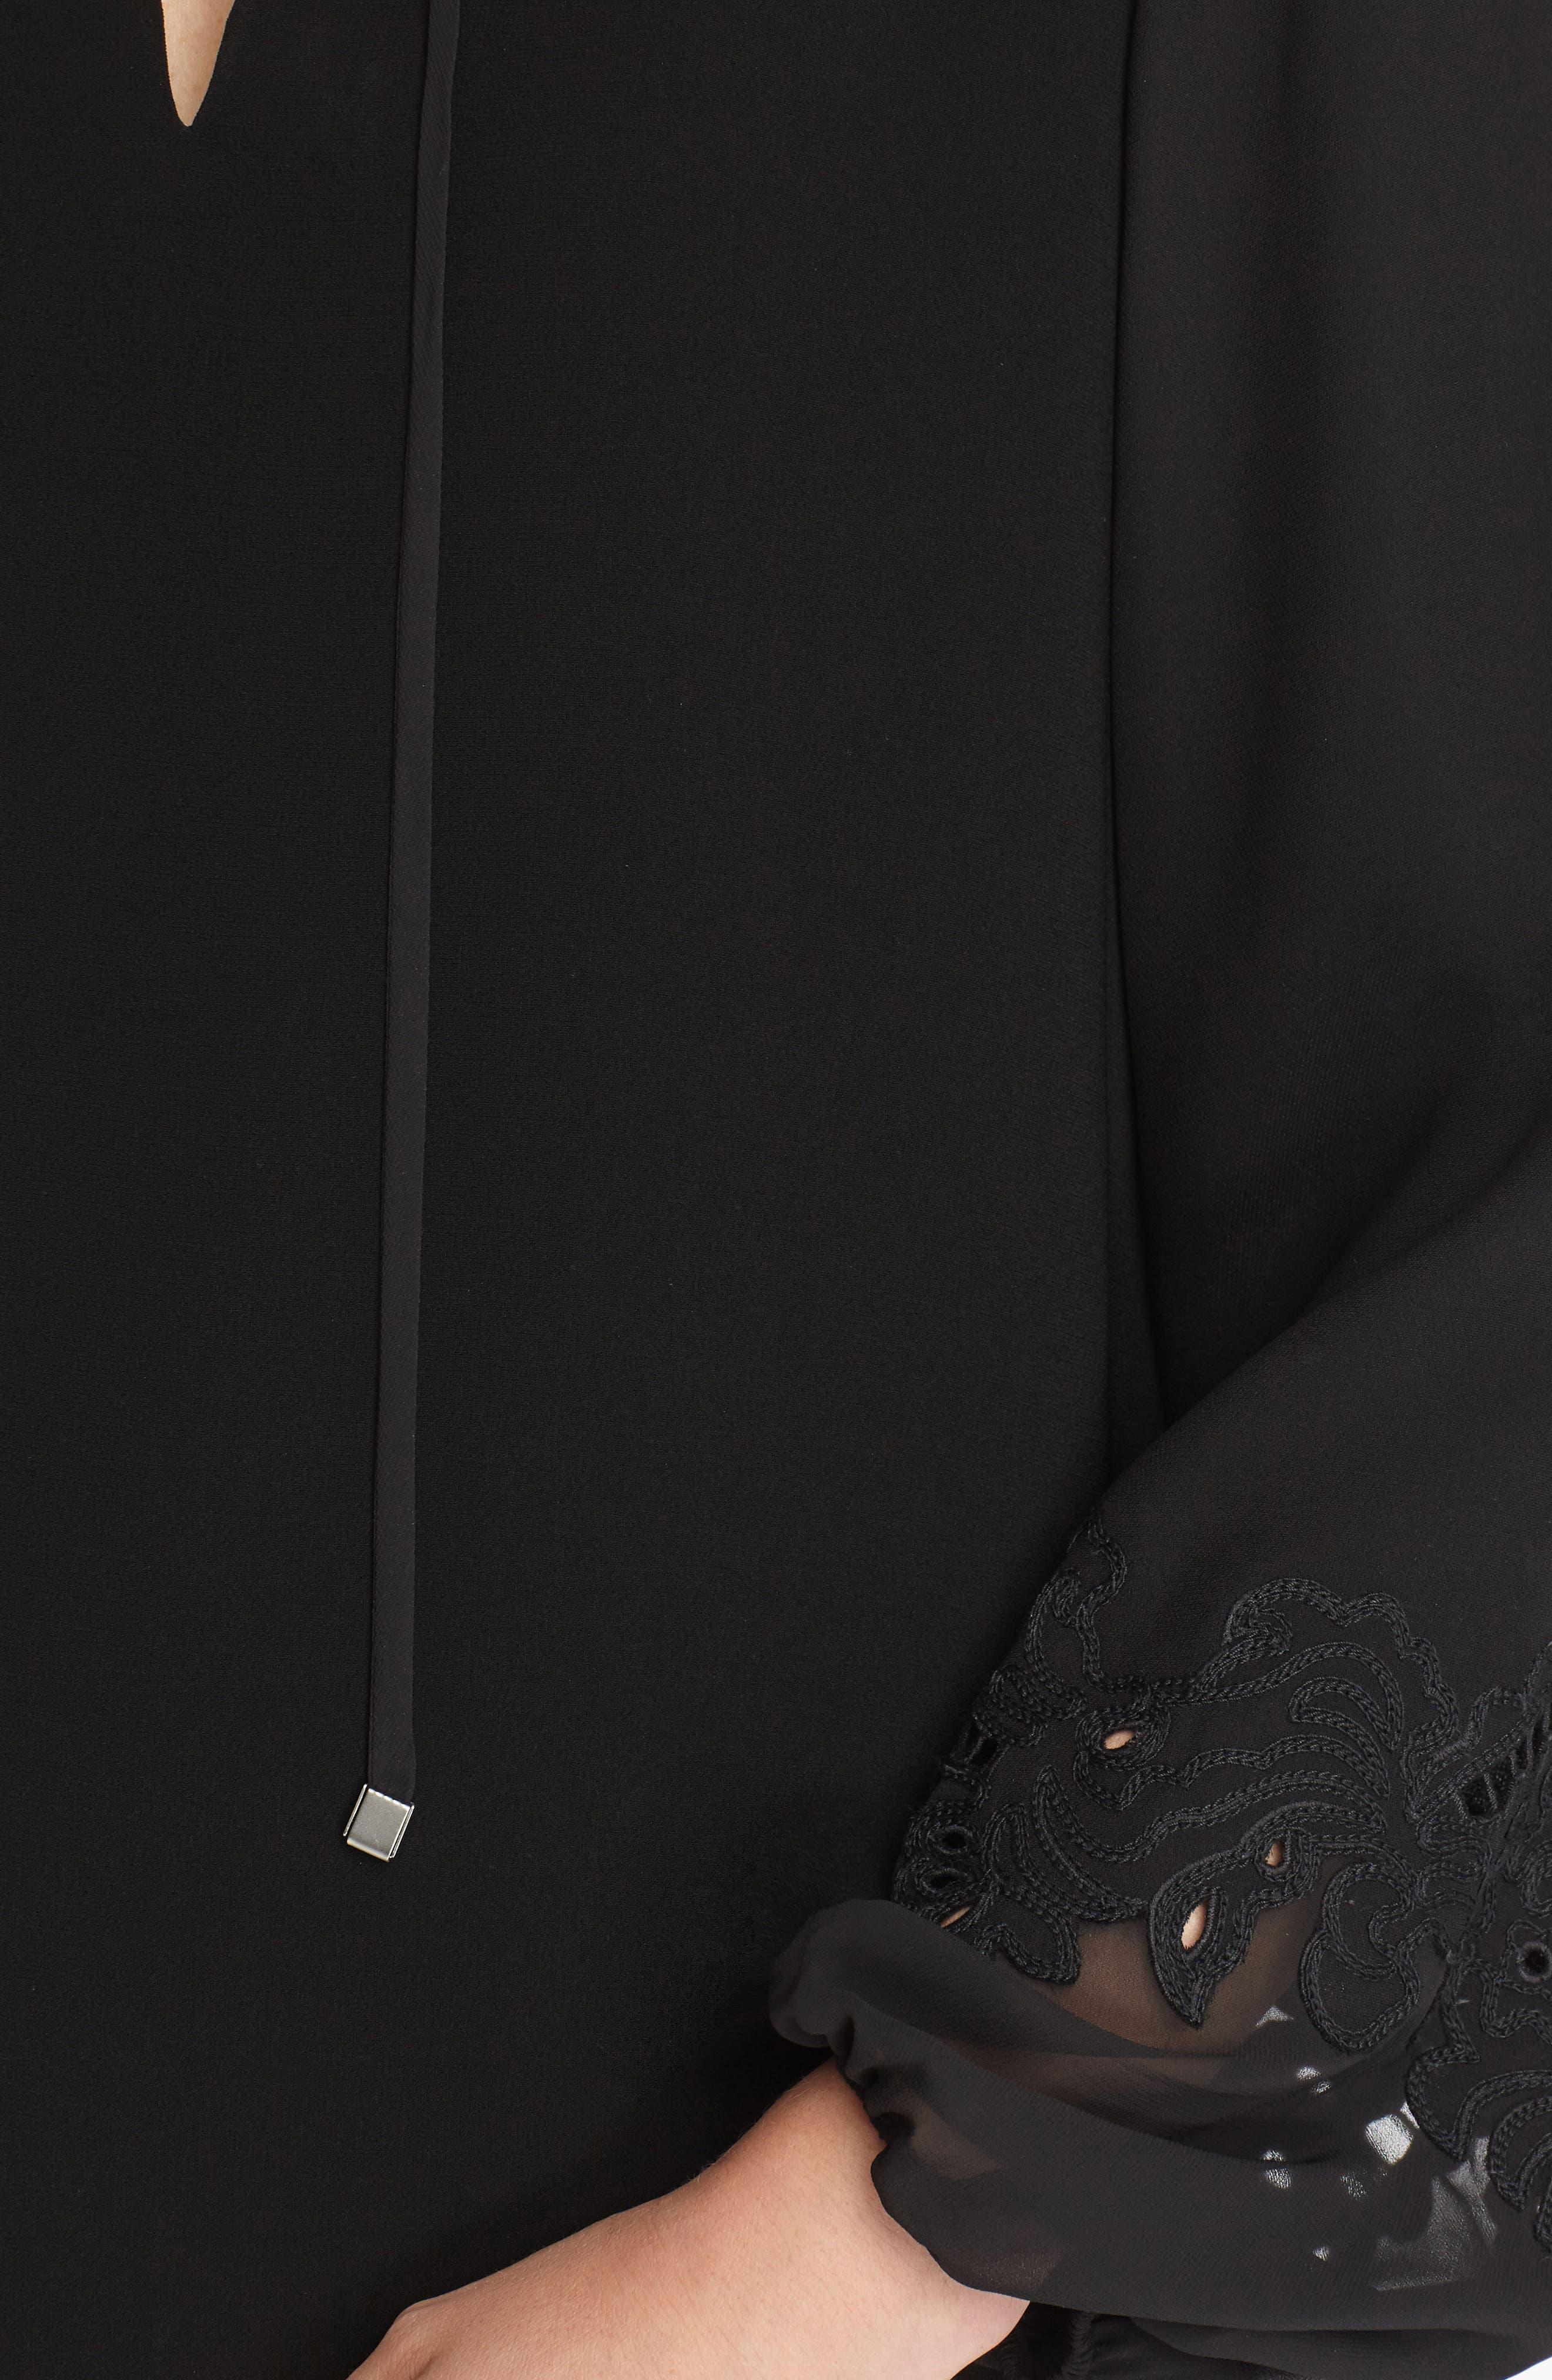 Eli Embroidered Cuff Chiffon Dress,                             Alternate thumbnail 3, color,                             001